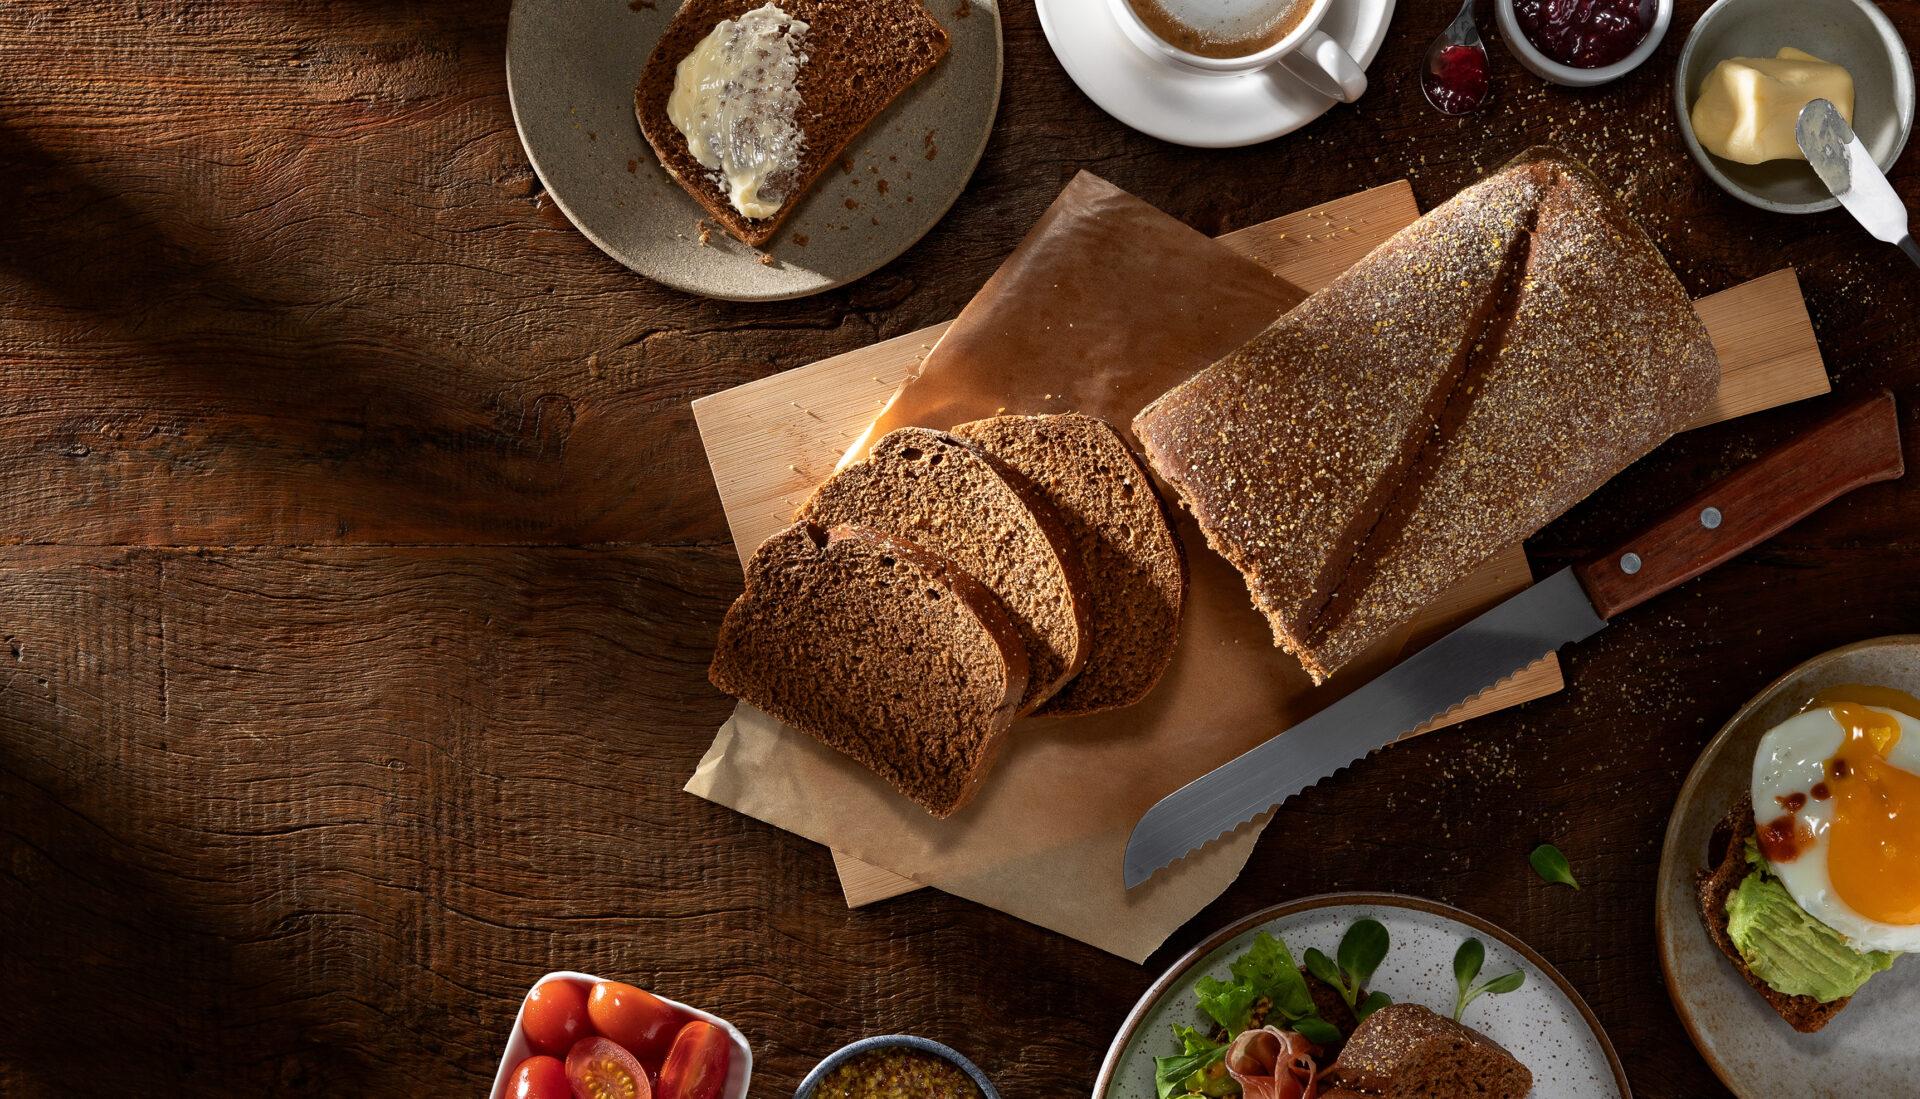 Outbread, Outback, Restaurante